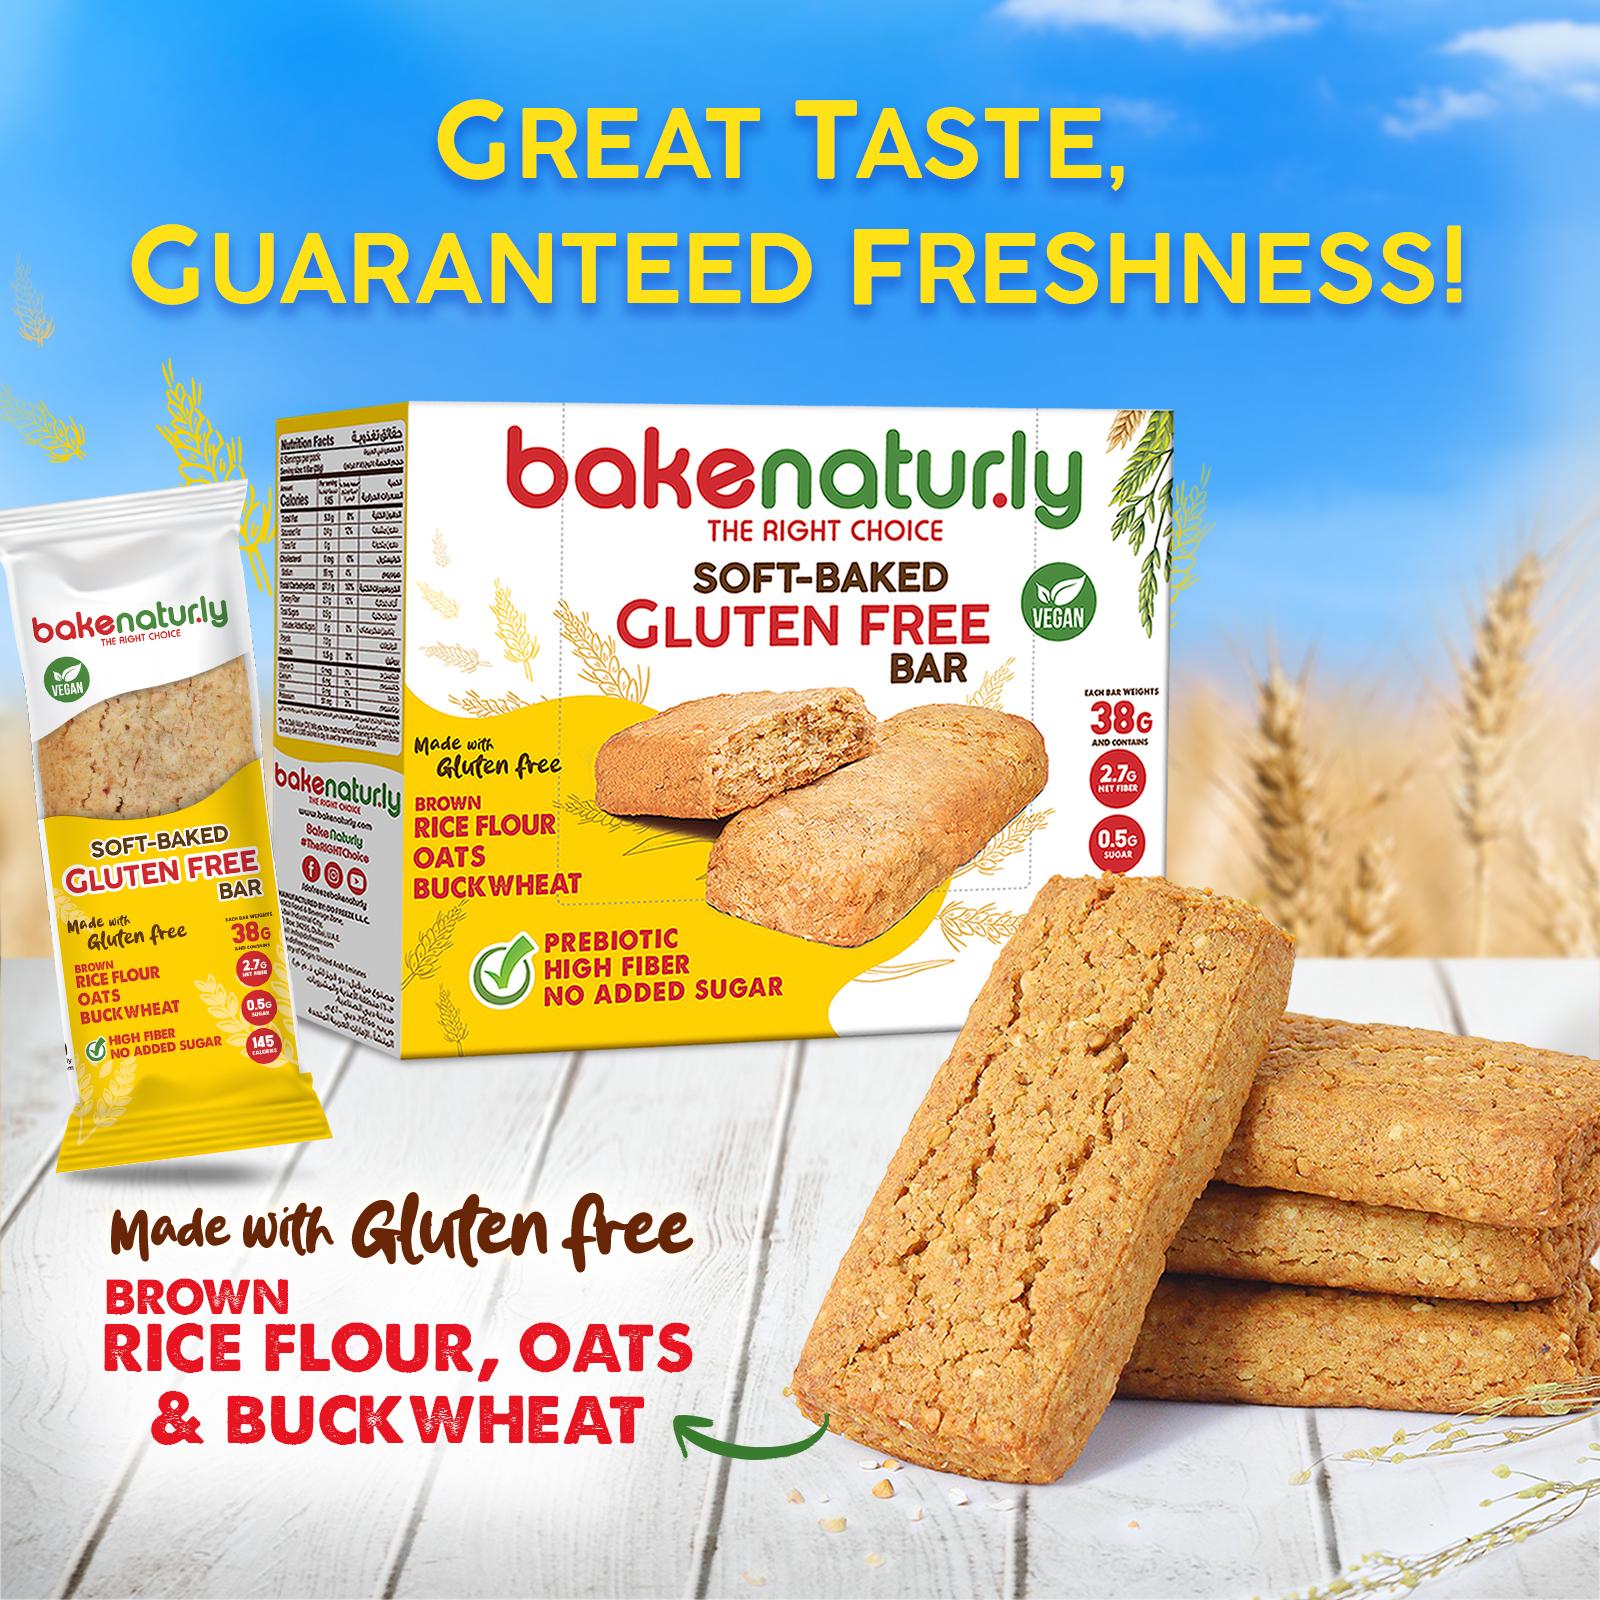 Bake Naturly Gluten Free Bar Press Release 02